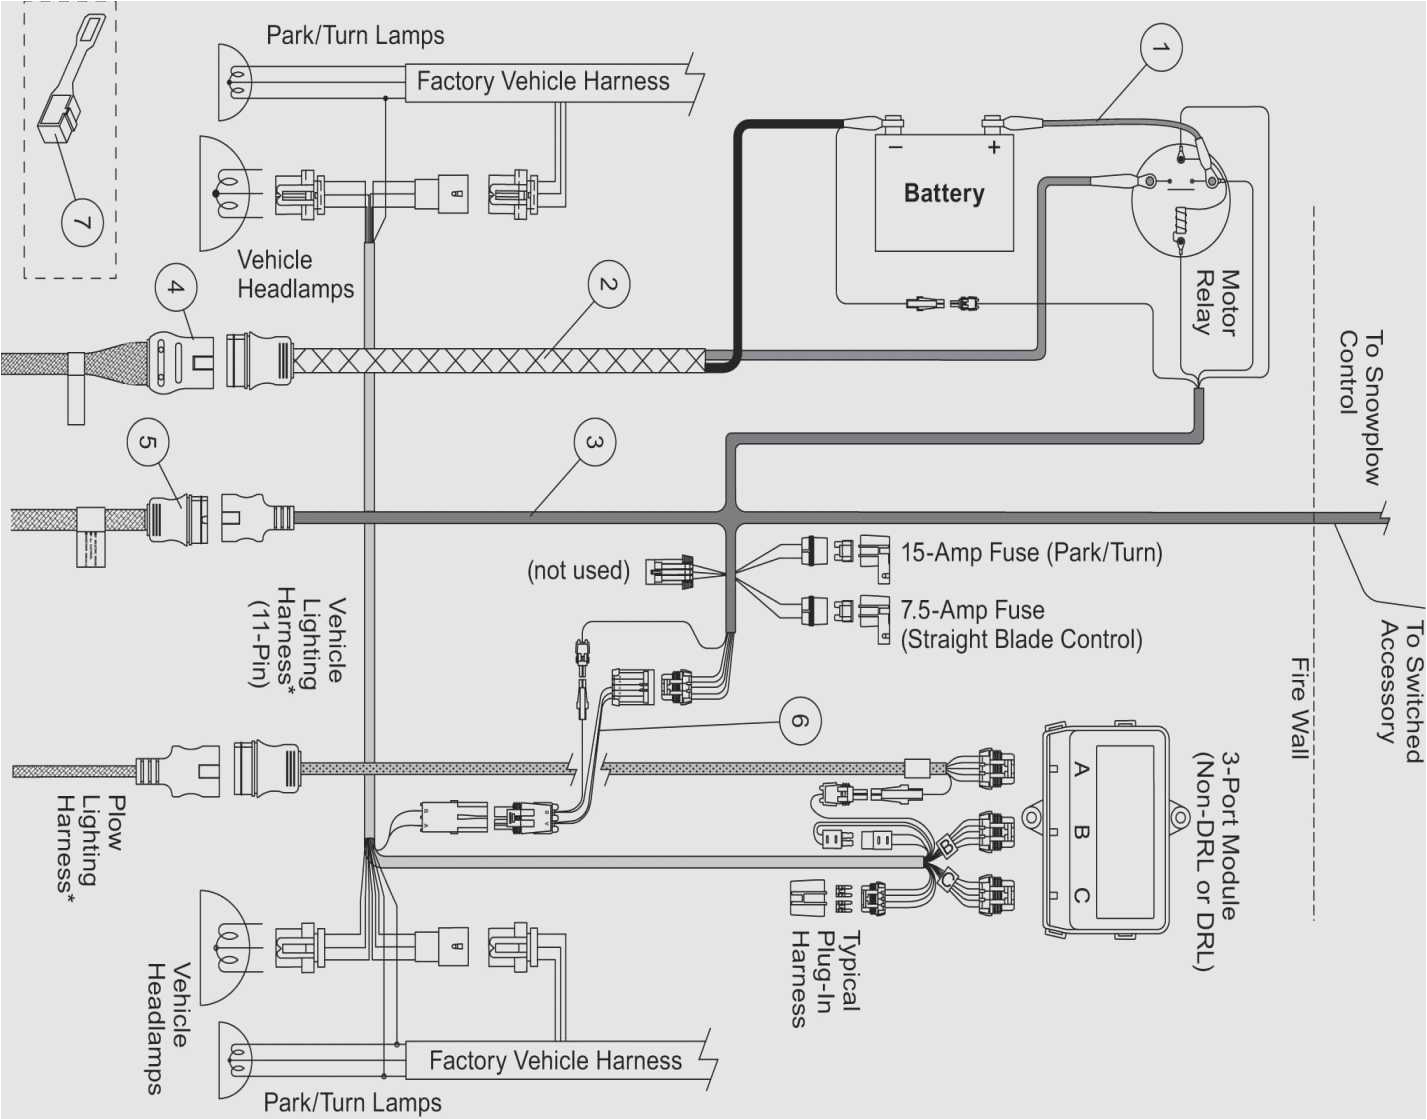 western snow plow wiring 1975 blog wiring diagramsnowplowlights wireing diagram uni mount plow emprendedorlink western pro